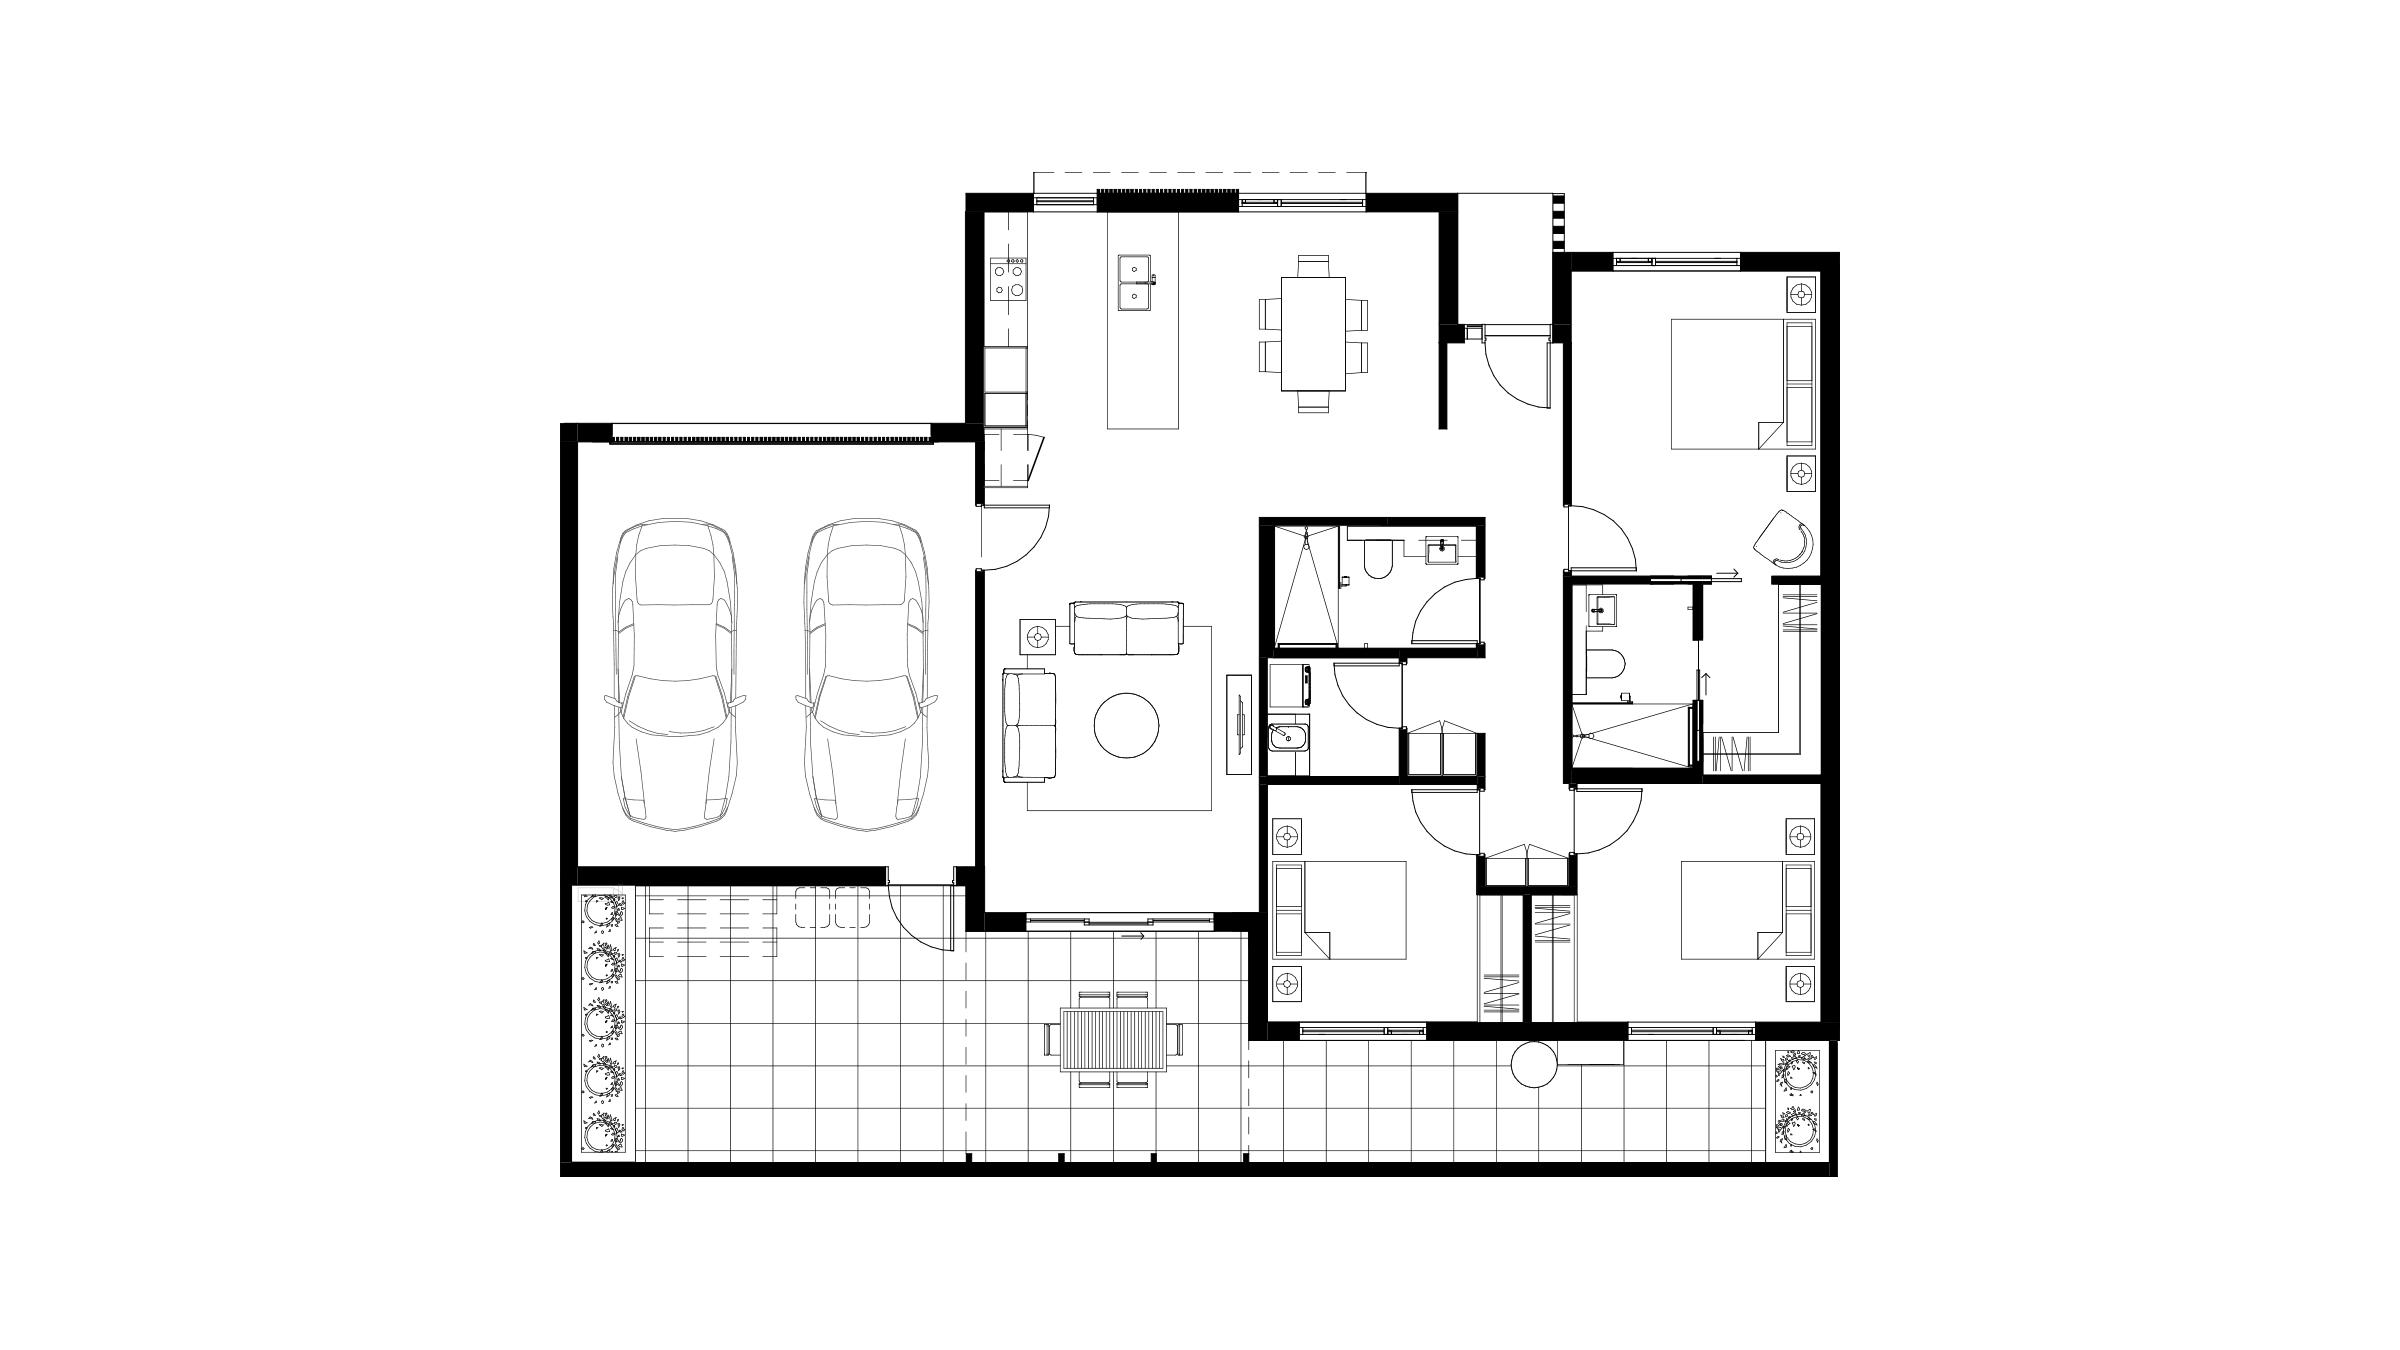 Baptcare, Strathalan (retirement living) - unit 38 floor plan